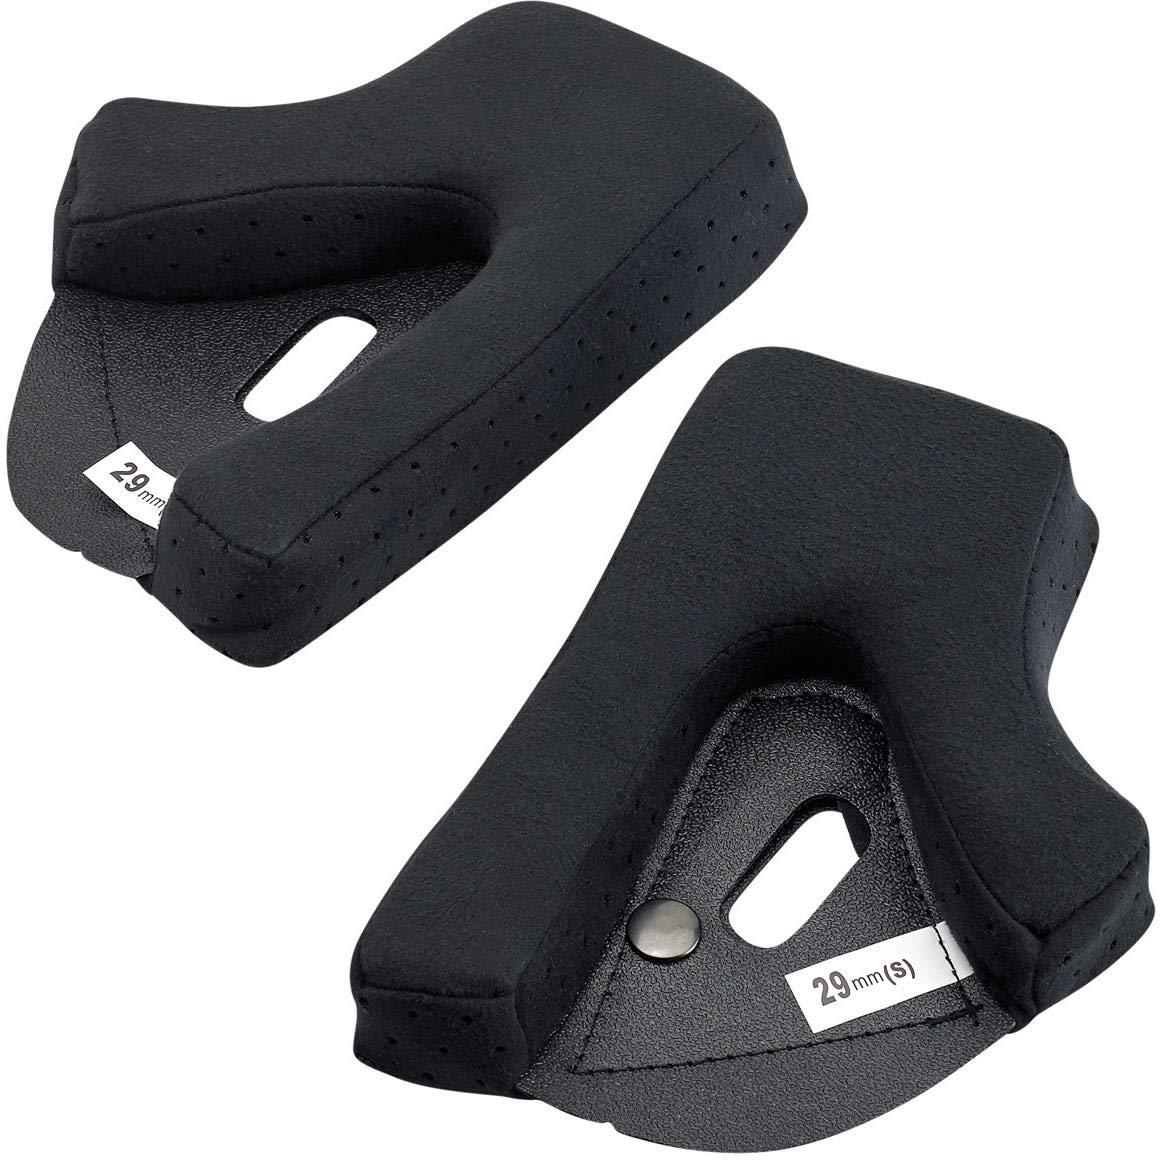 Biltwell Unisex-Adult Gringo S Cheek Pad Set (Black 21mm